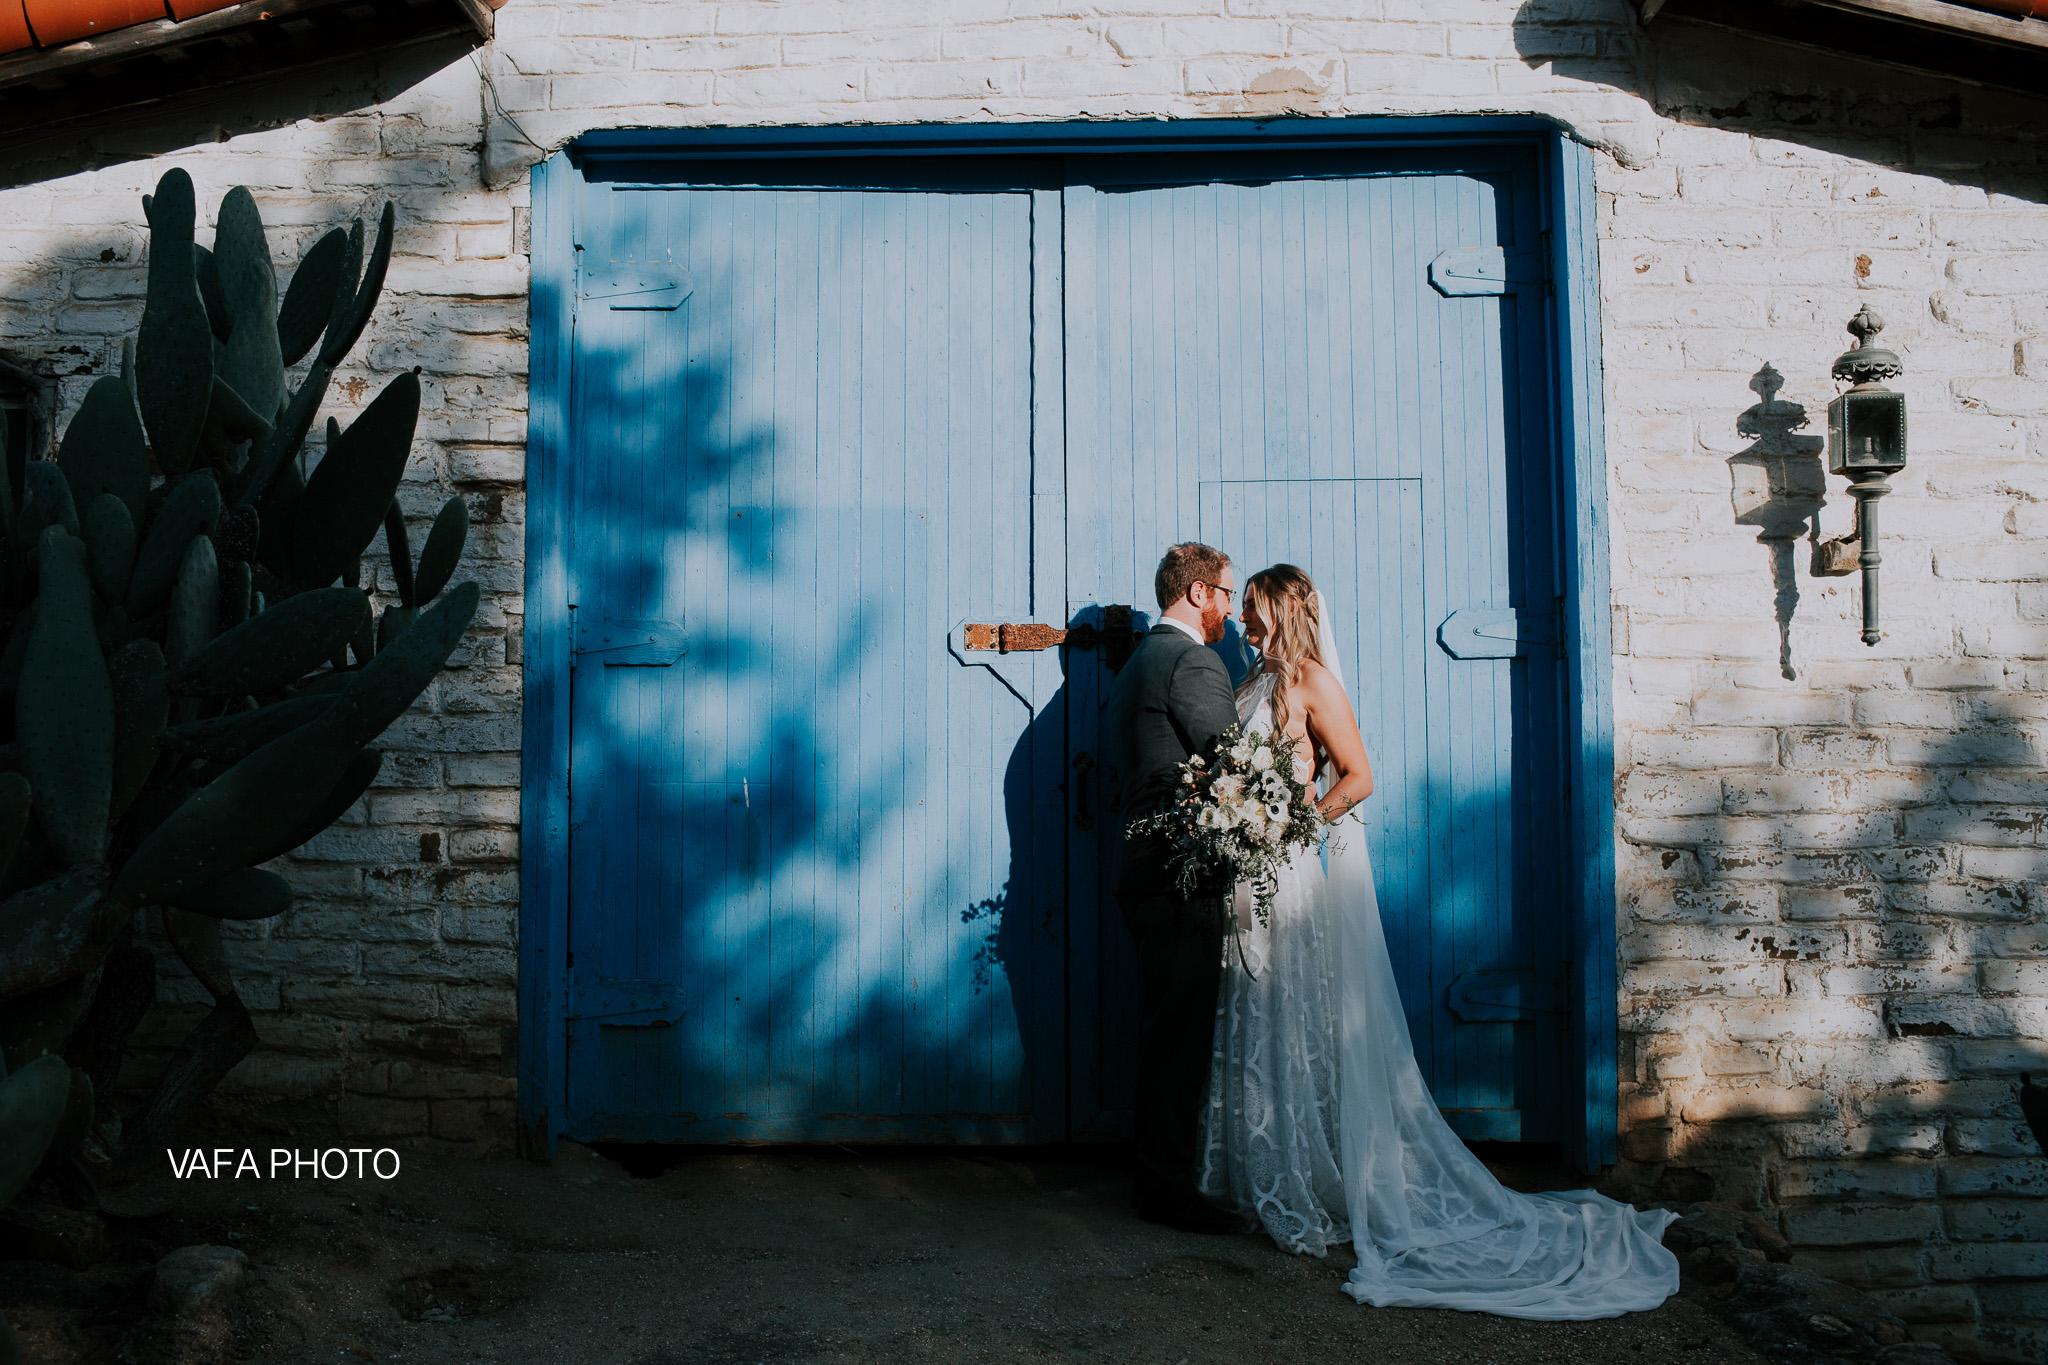 Leo-Carrillo-Ranch-Wedding-Lauren-Mike-Vafa-Photo-690.jpg